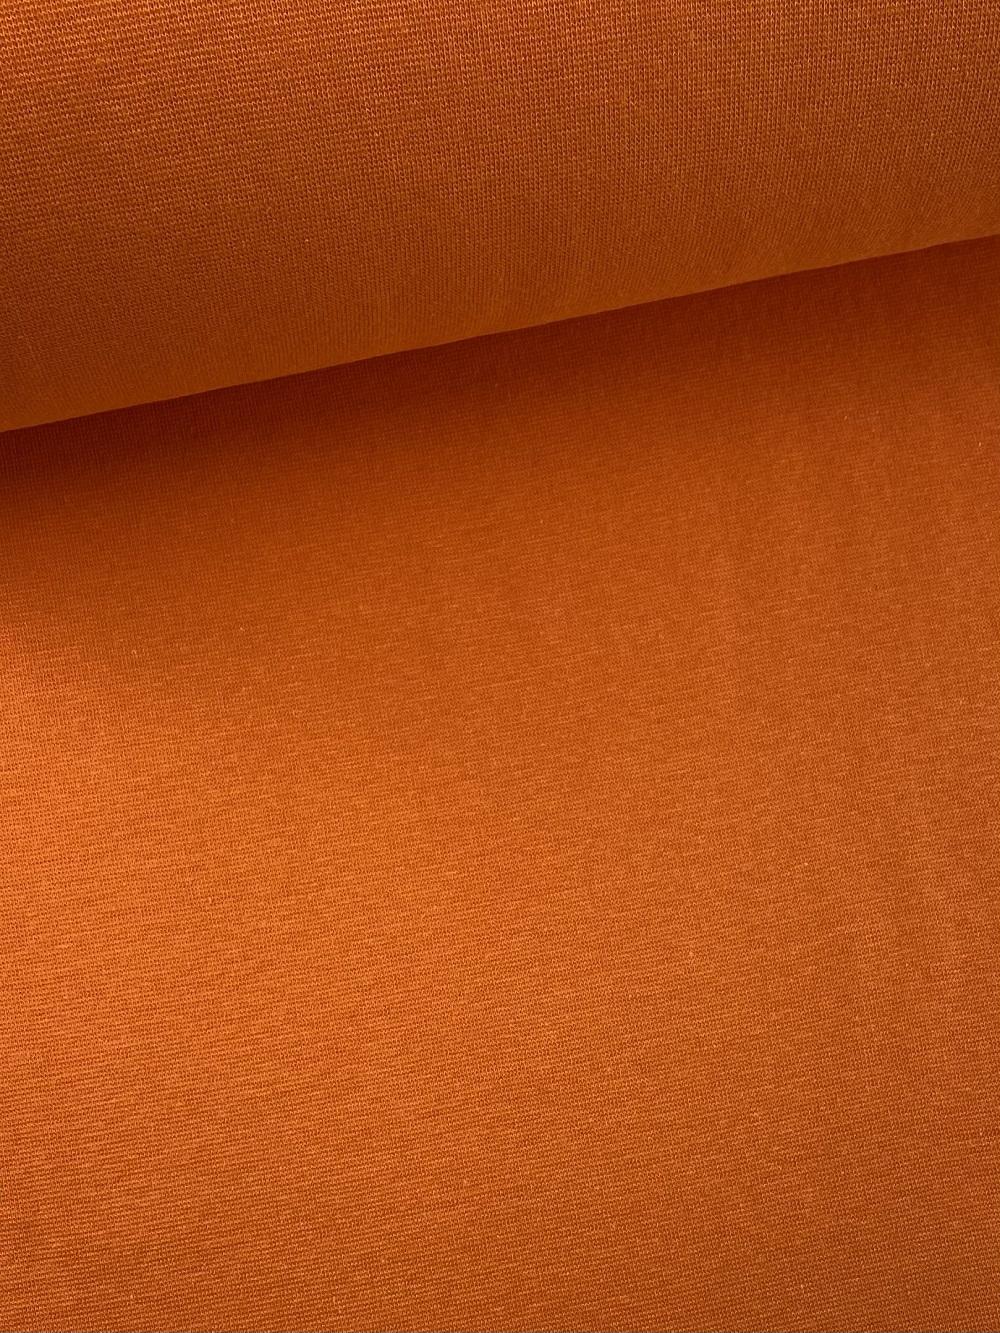 Bündchenware (glatt), orange. Art. SW10624